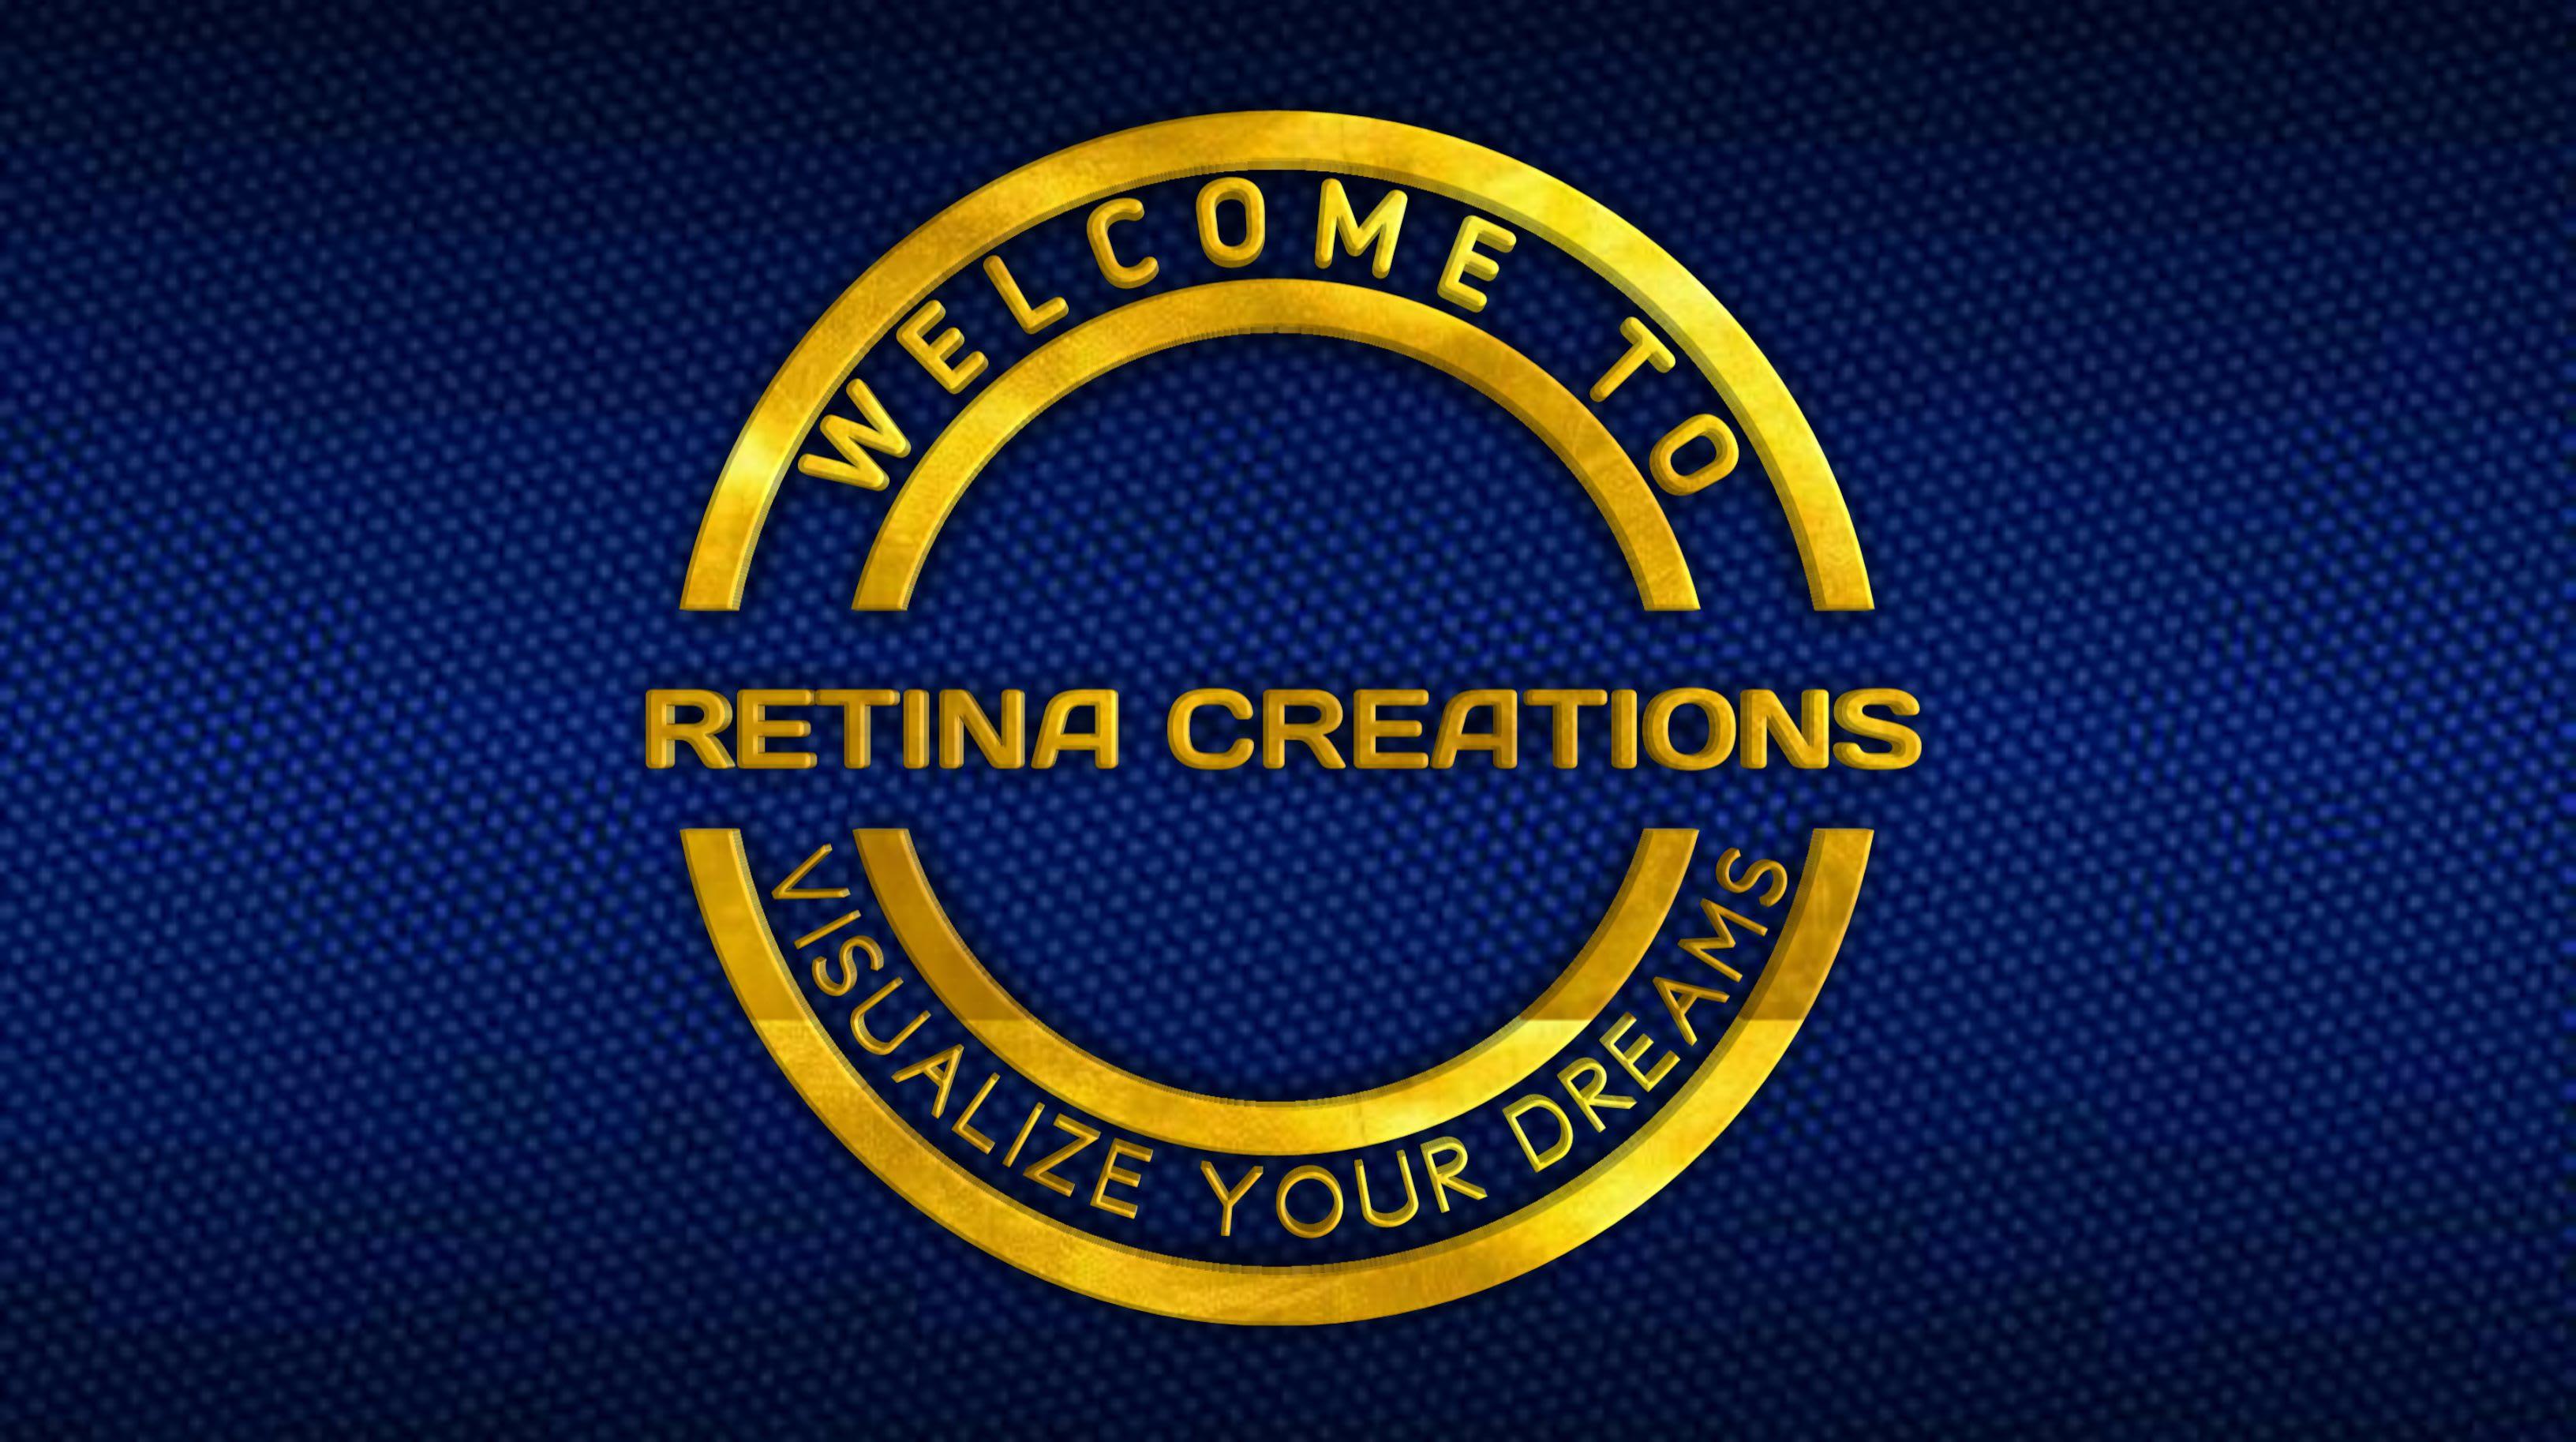 Retina Creations